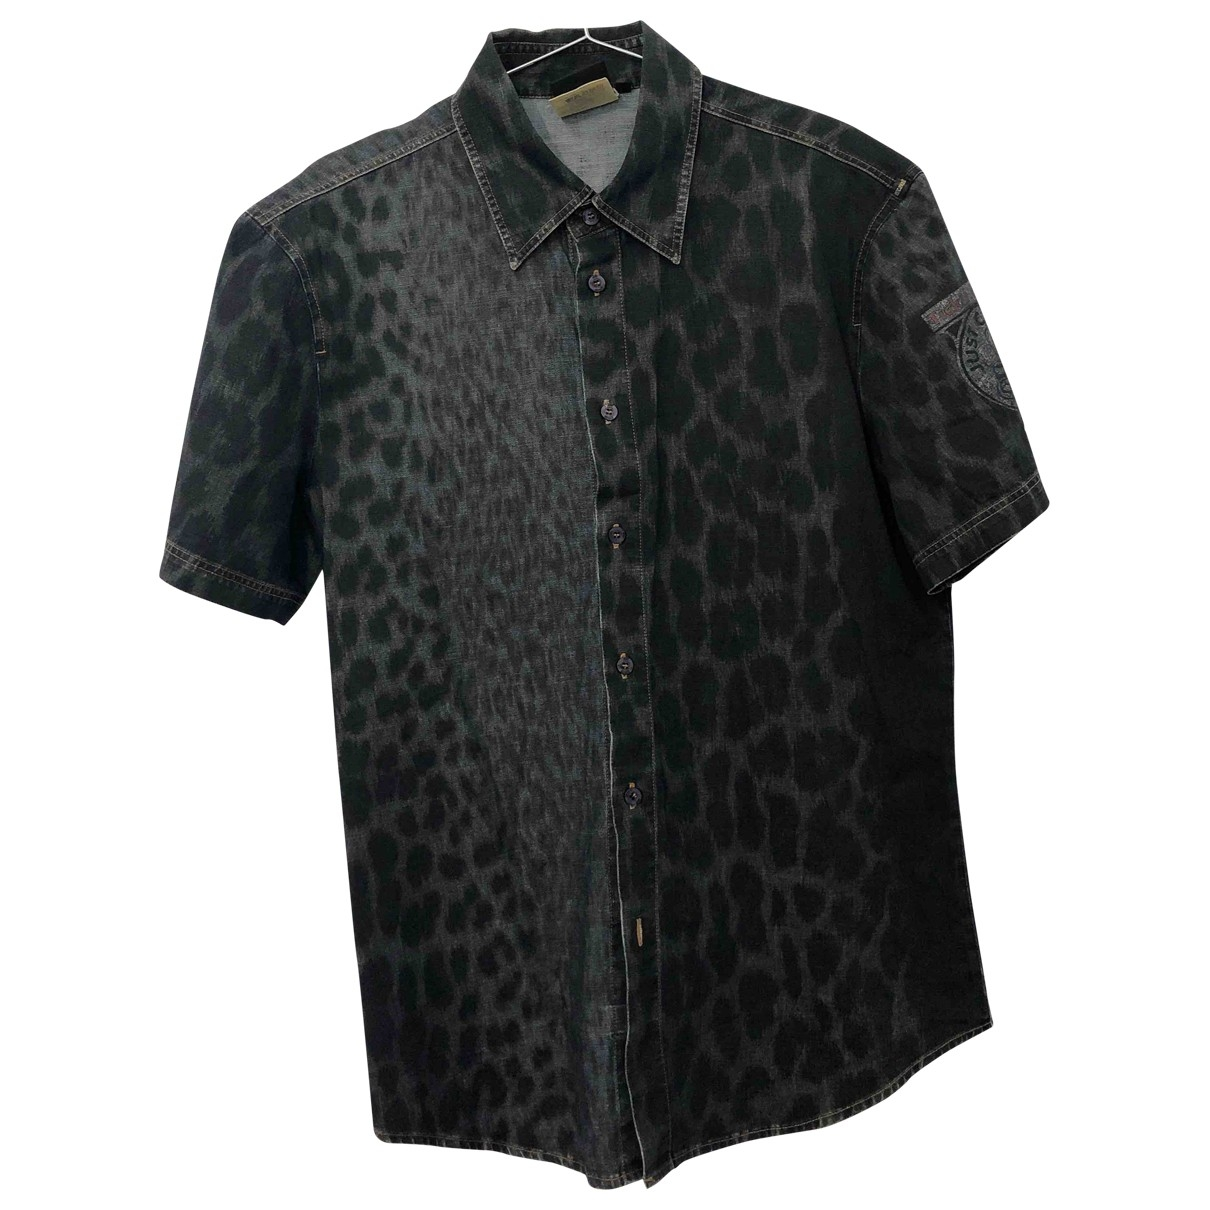 Just Cavalli \N Blue Cotton Shirts for Men S International